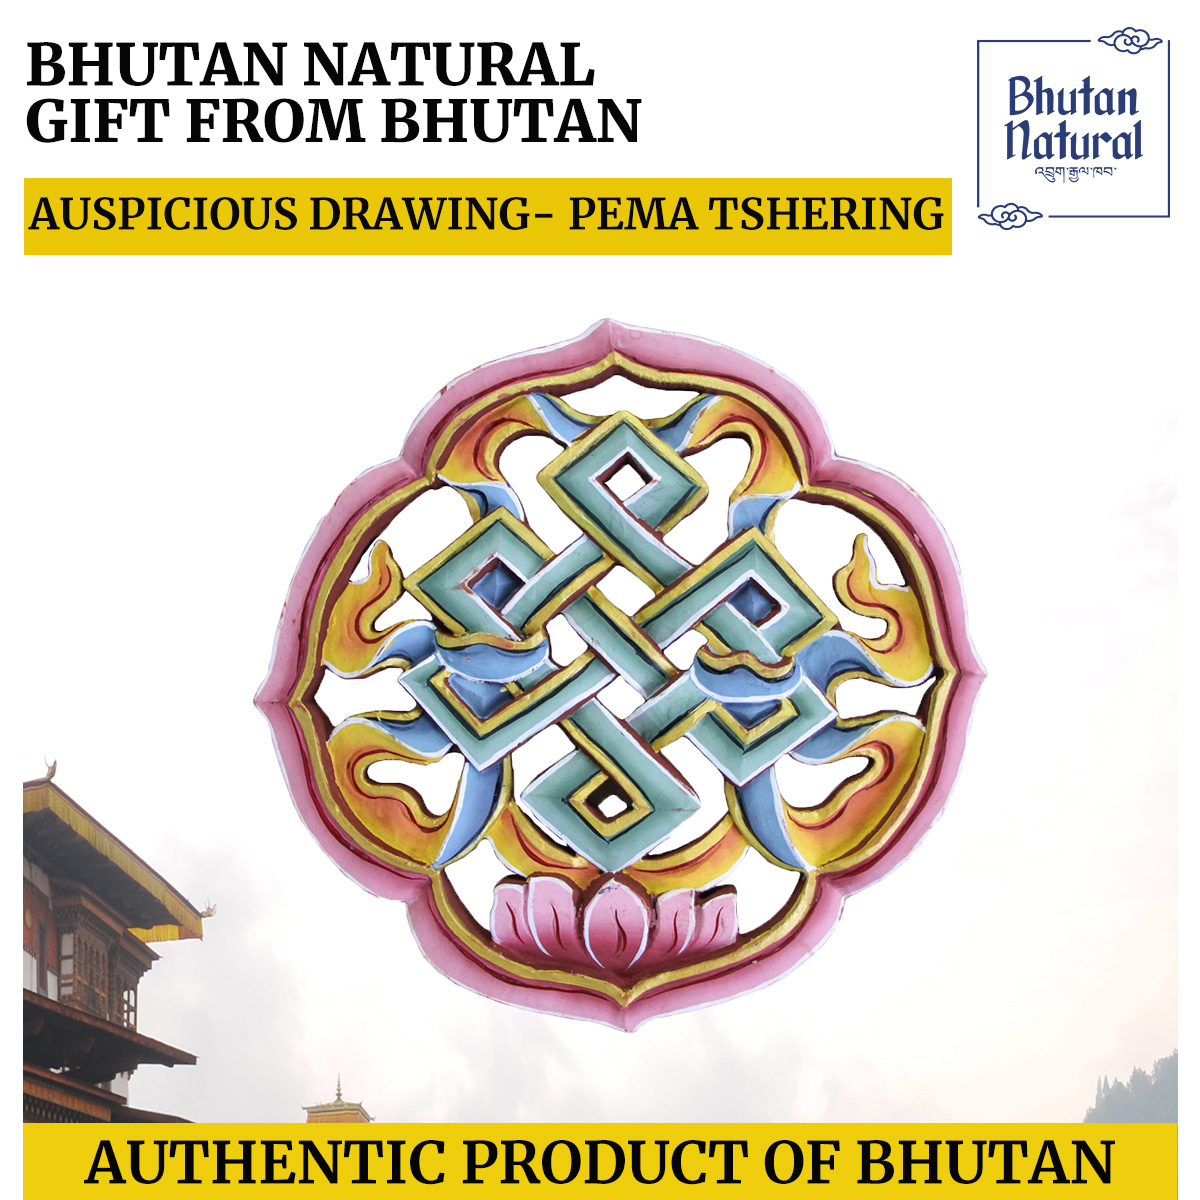 Pema Tshering Auspicious Drawing Bhutans Cerebral Palsy Foot Artist Wood Craving Decor